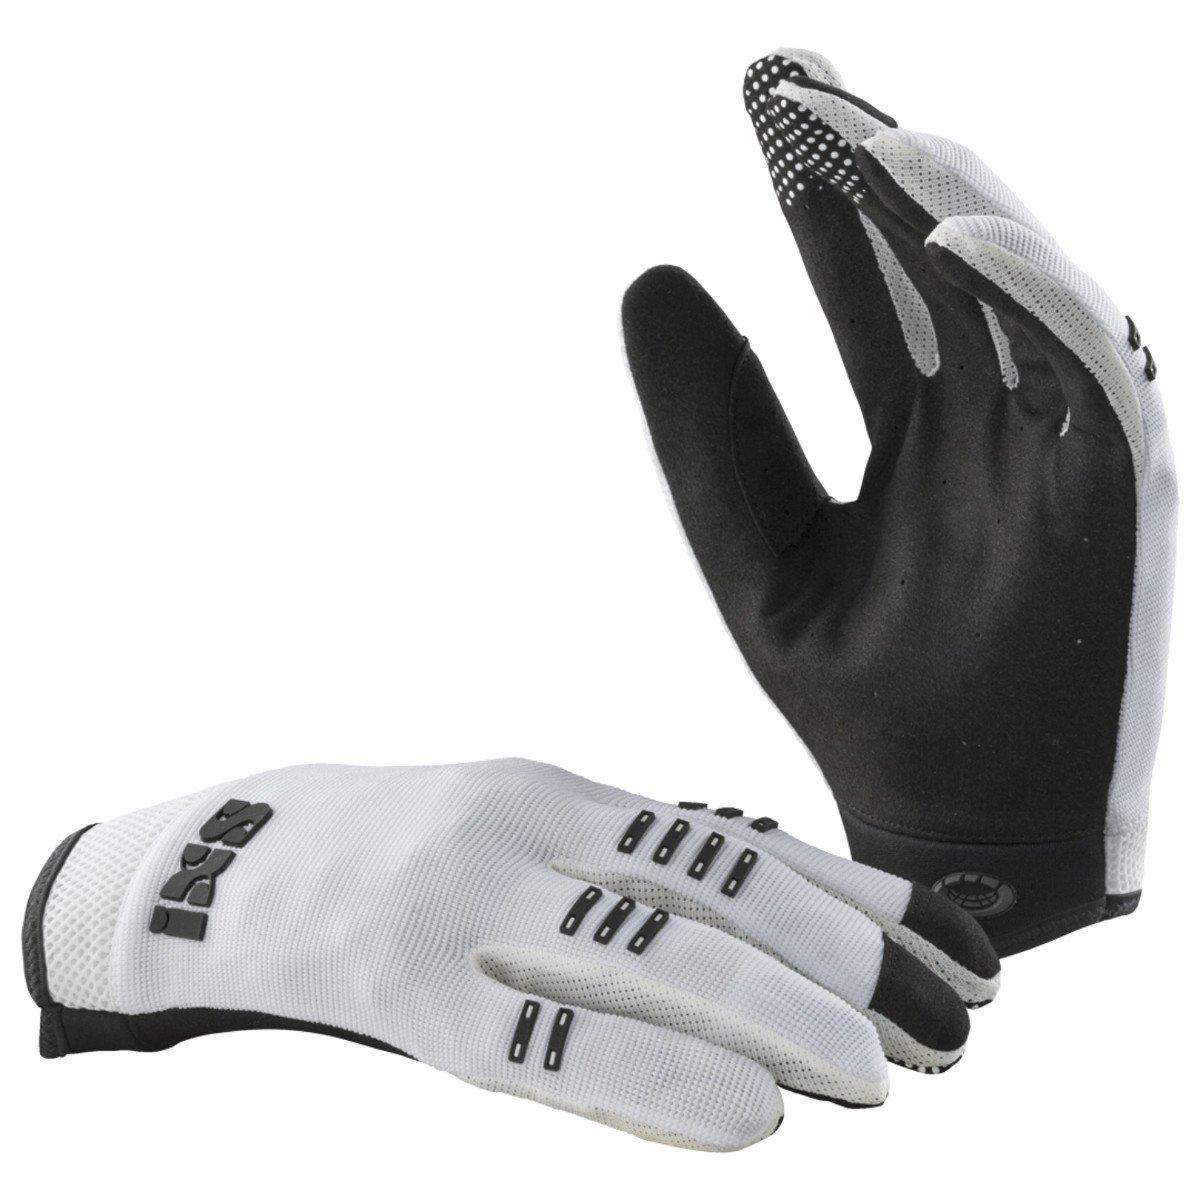 IXS Downhill-Handschuhe BC-X3.1 Weiß Gr. S